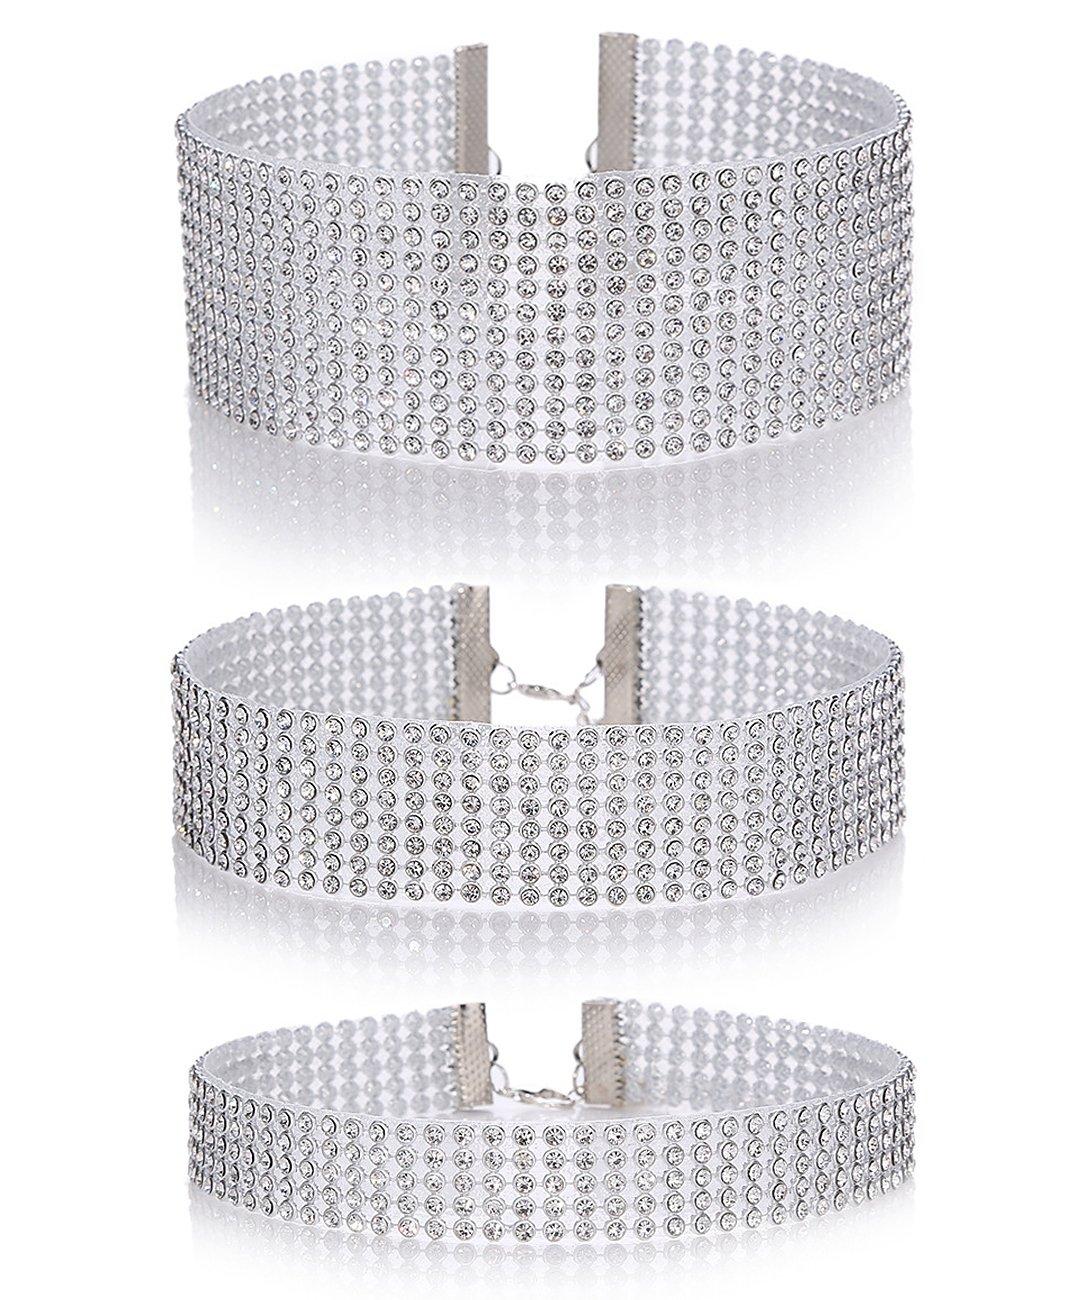 Naimo 3pcs Different Size Diamond Crystal Rhinestone Choker Necklace Wedding Collar Necklace